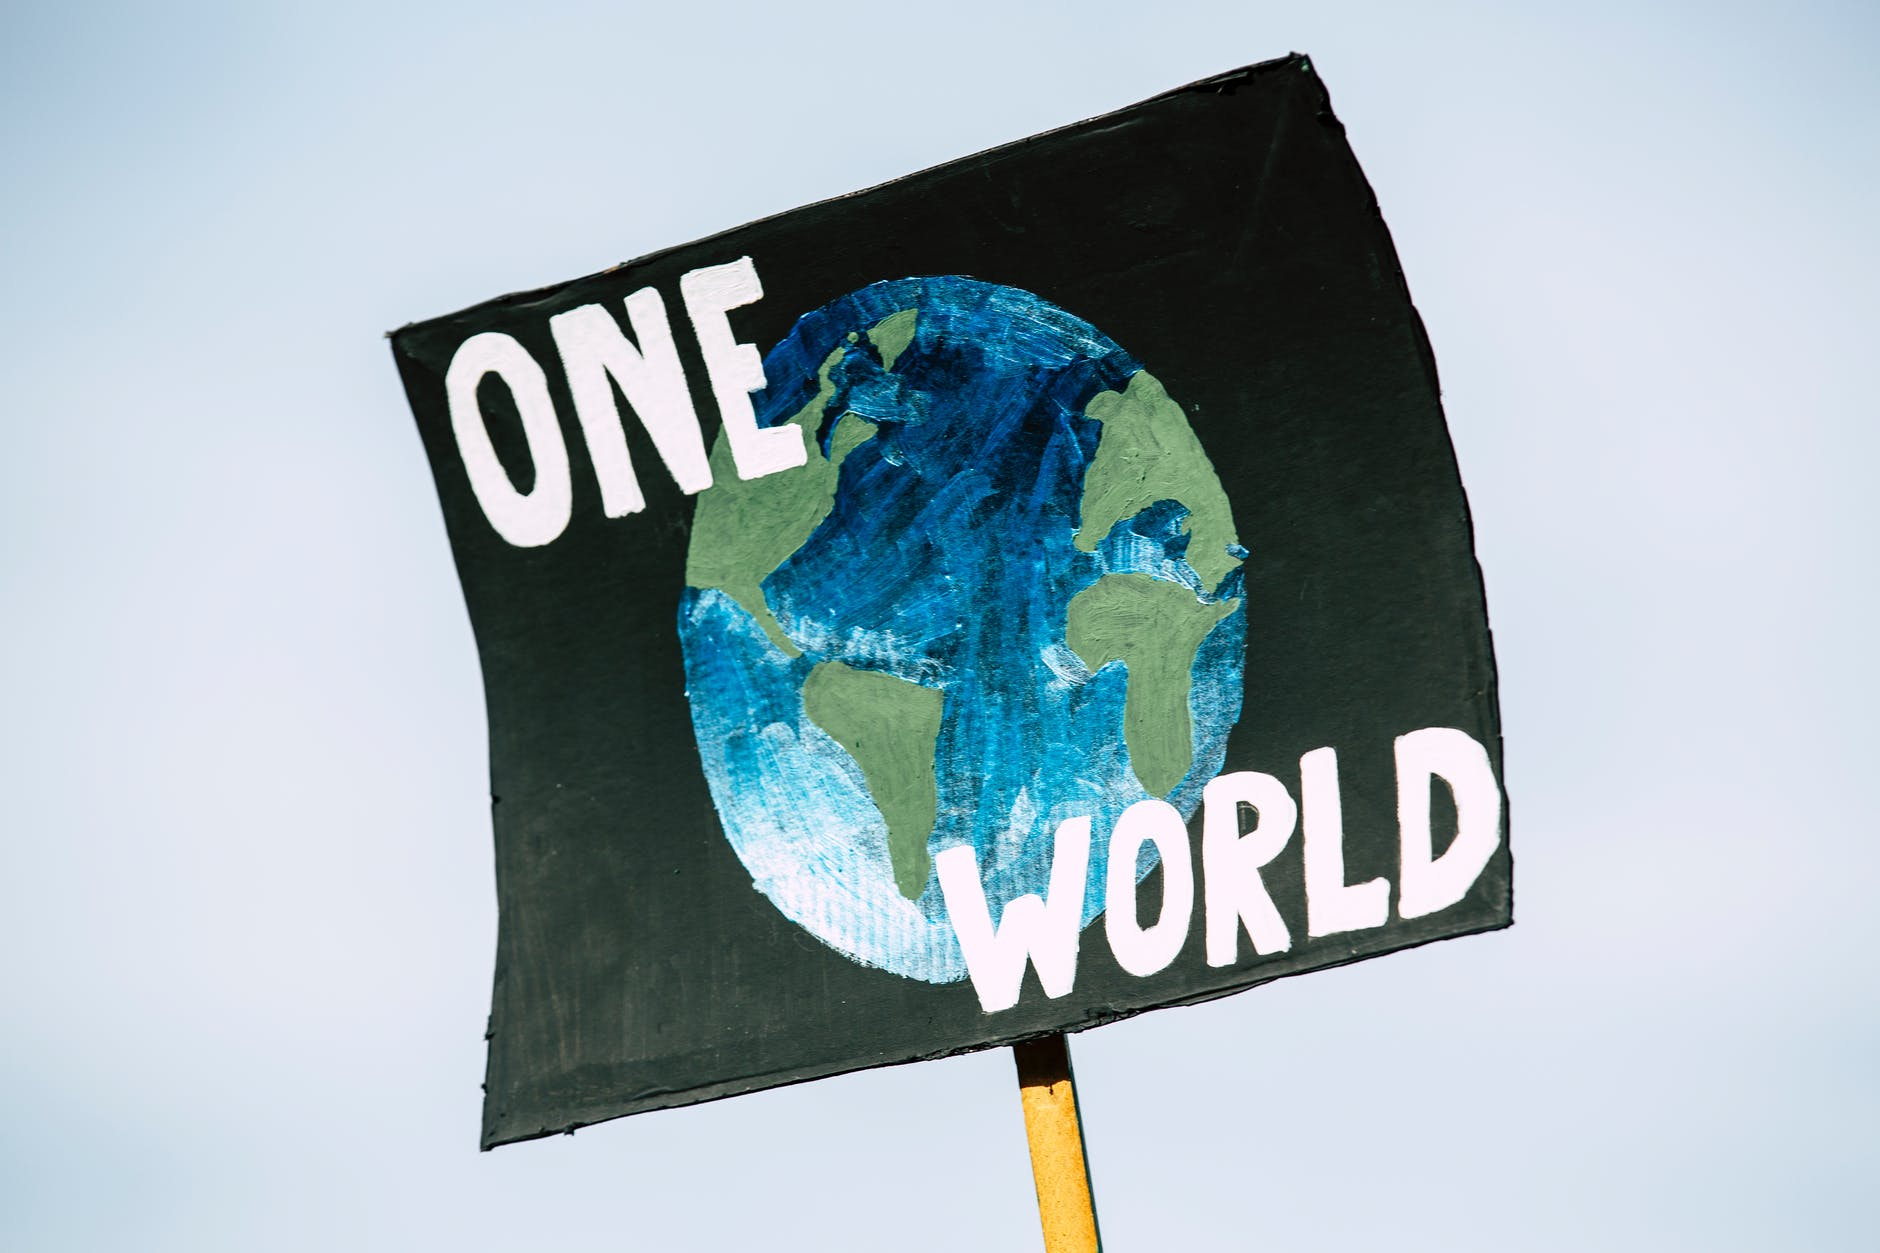 fenntarthatóság környezettudatosság zöld materializmus